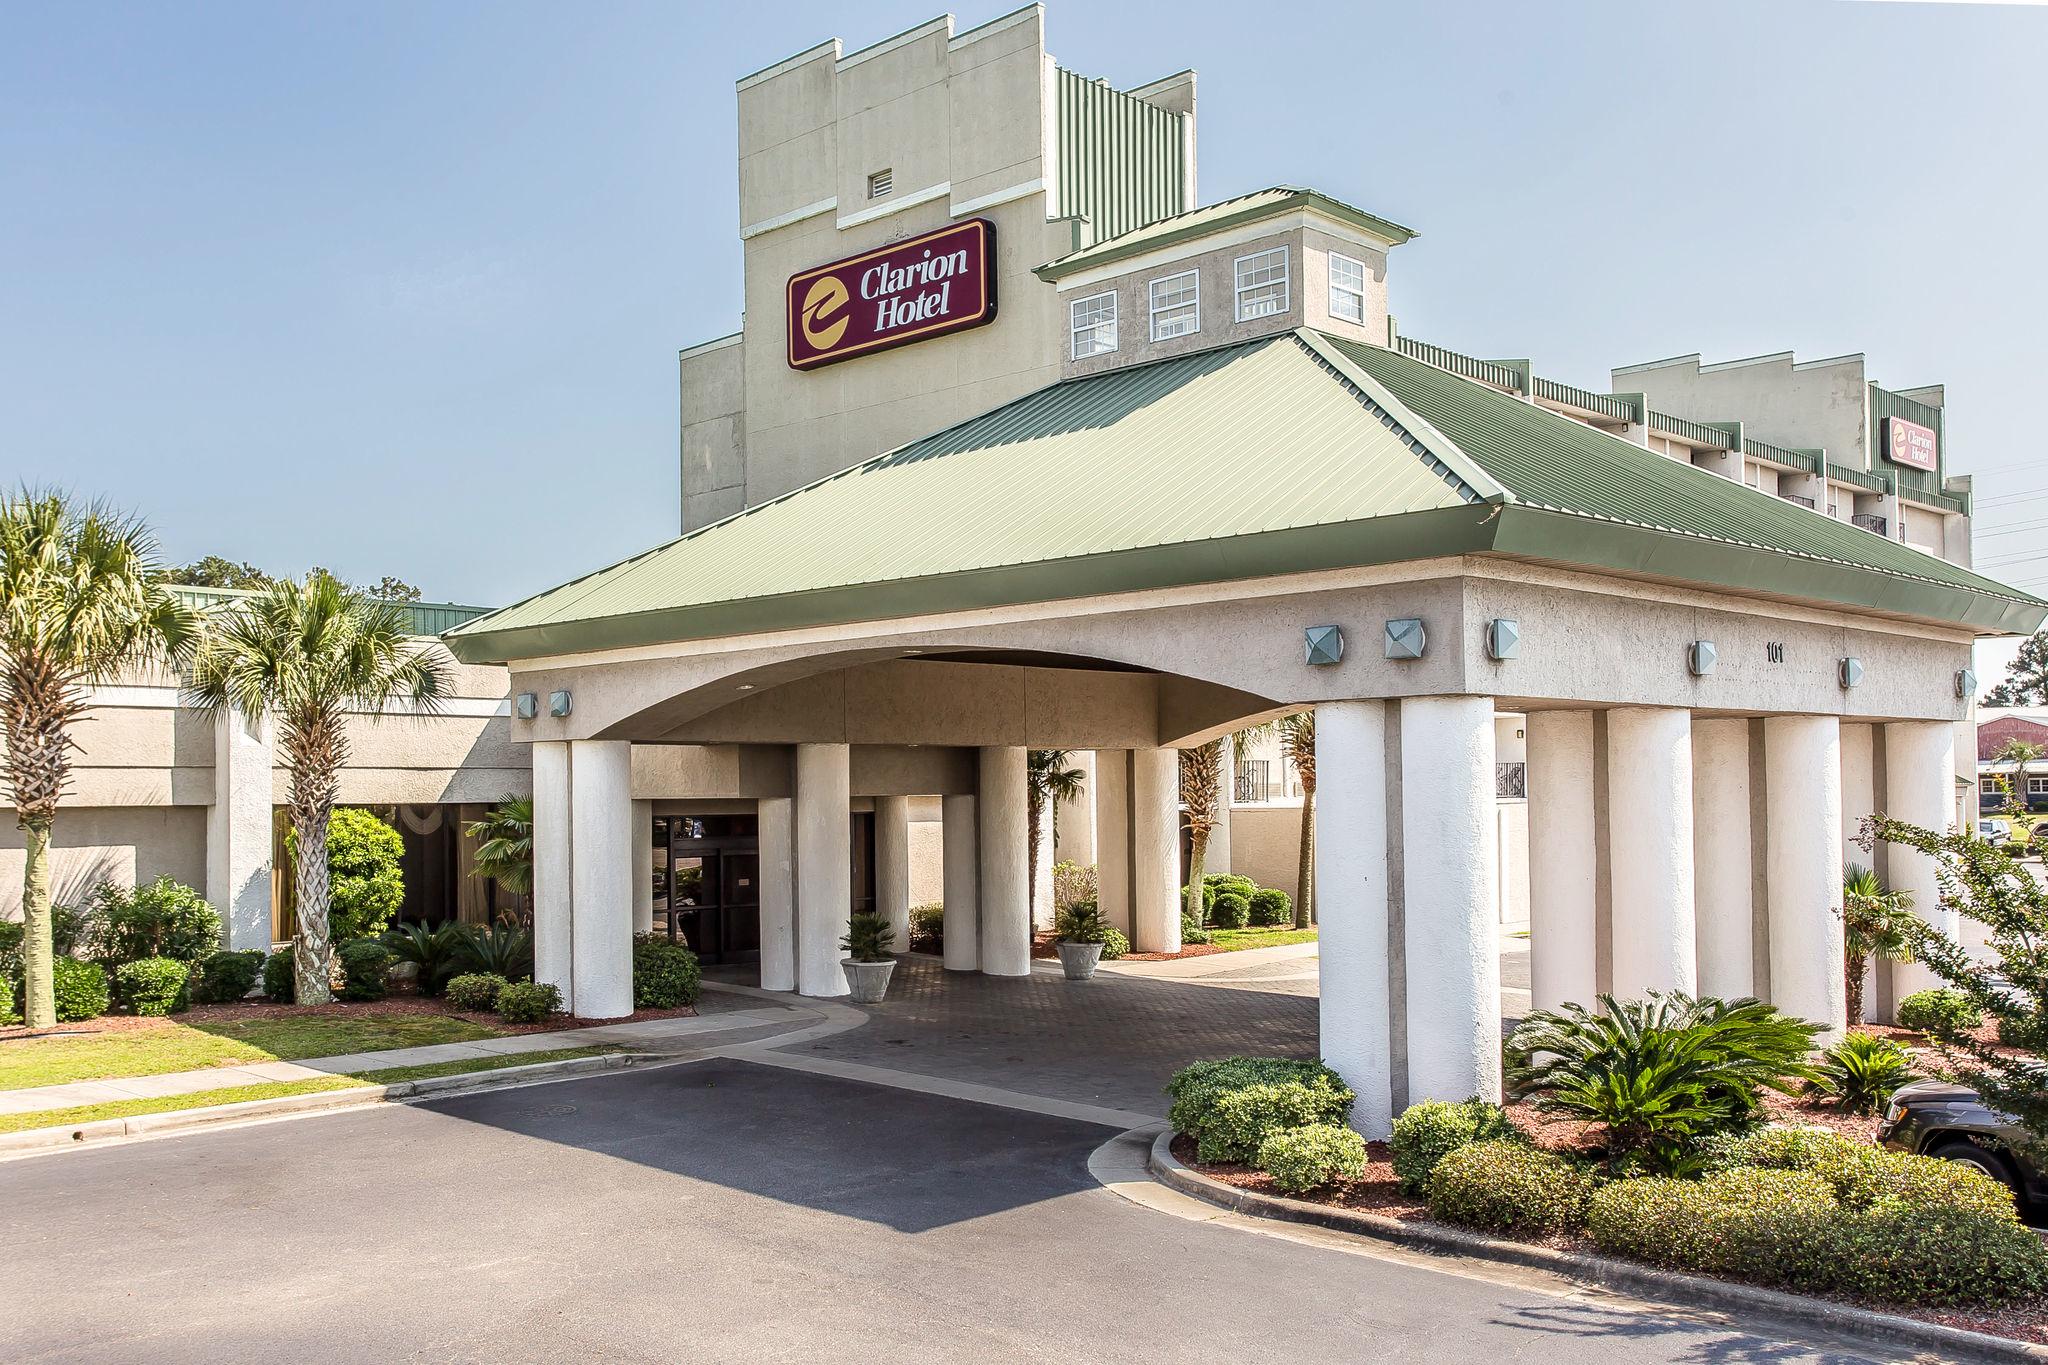 Clarion Hotel in Myrtle Beach, SC | Whitepages